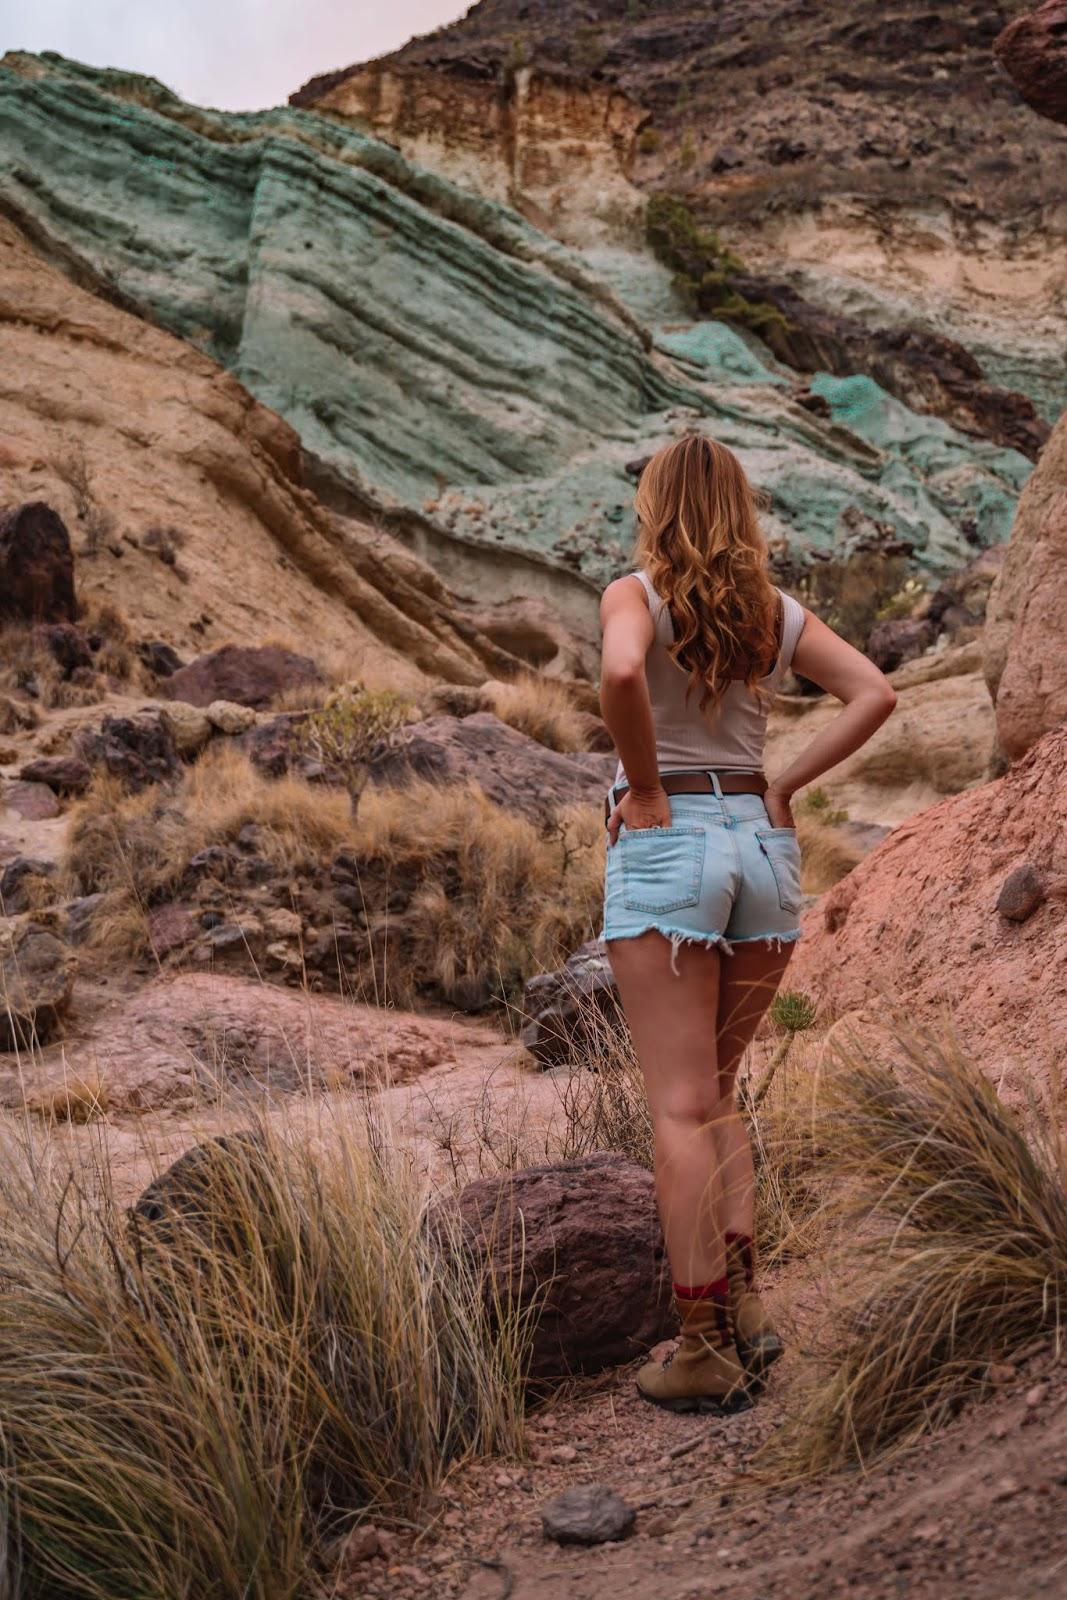 Los Azulejos - fashionstylebyjohanna - wandern - wanderoutfit - wandrn - im - winter -wandern - im -frühling- wanderoutfit - outdoorblogger